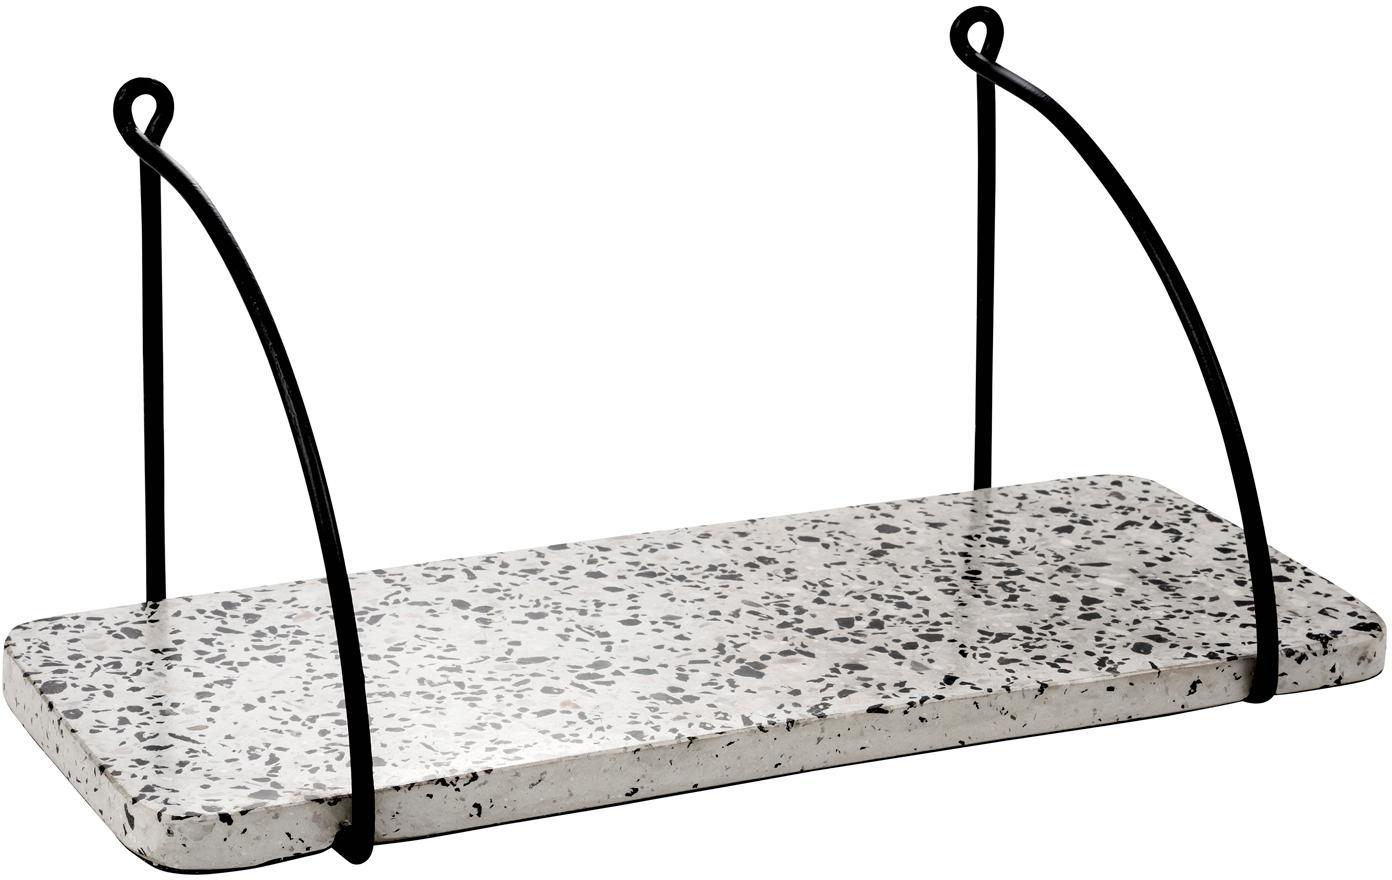 Terrazzo-Wandregal Porter, Regalbrett: Terrazzo, Halterung: Metall, lackiert, Weiß, Grautöne, Schwarz, 40 x 18 cm